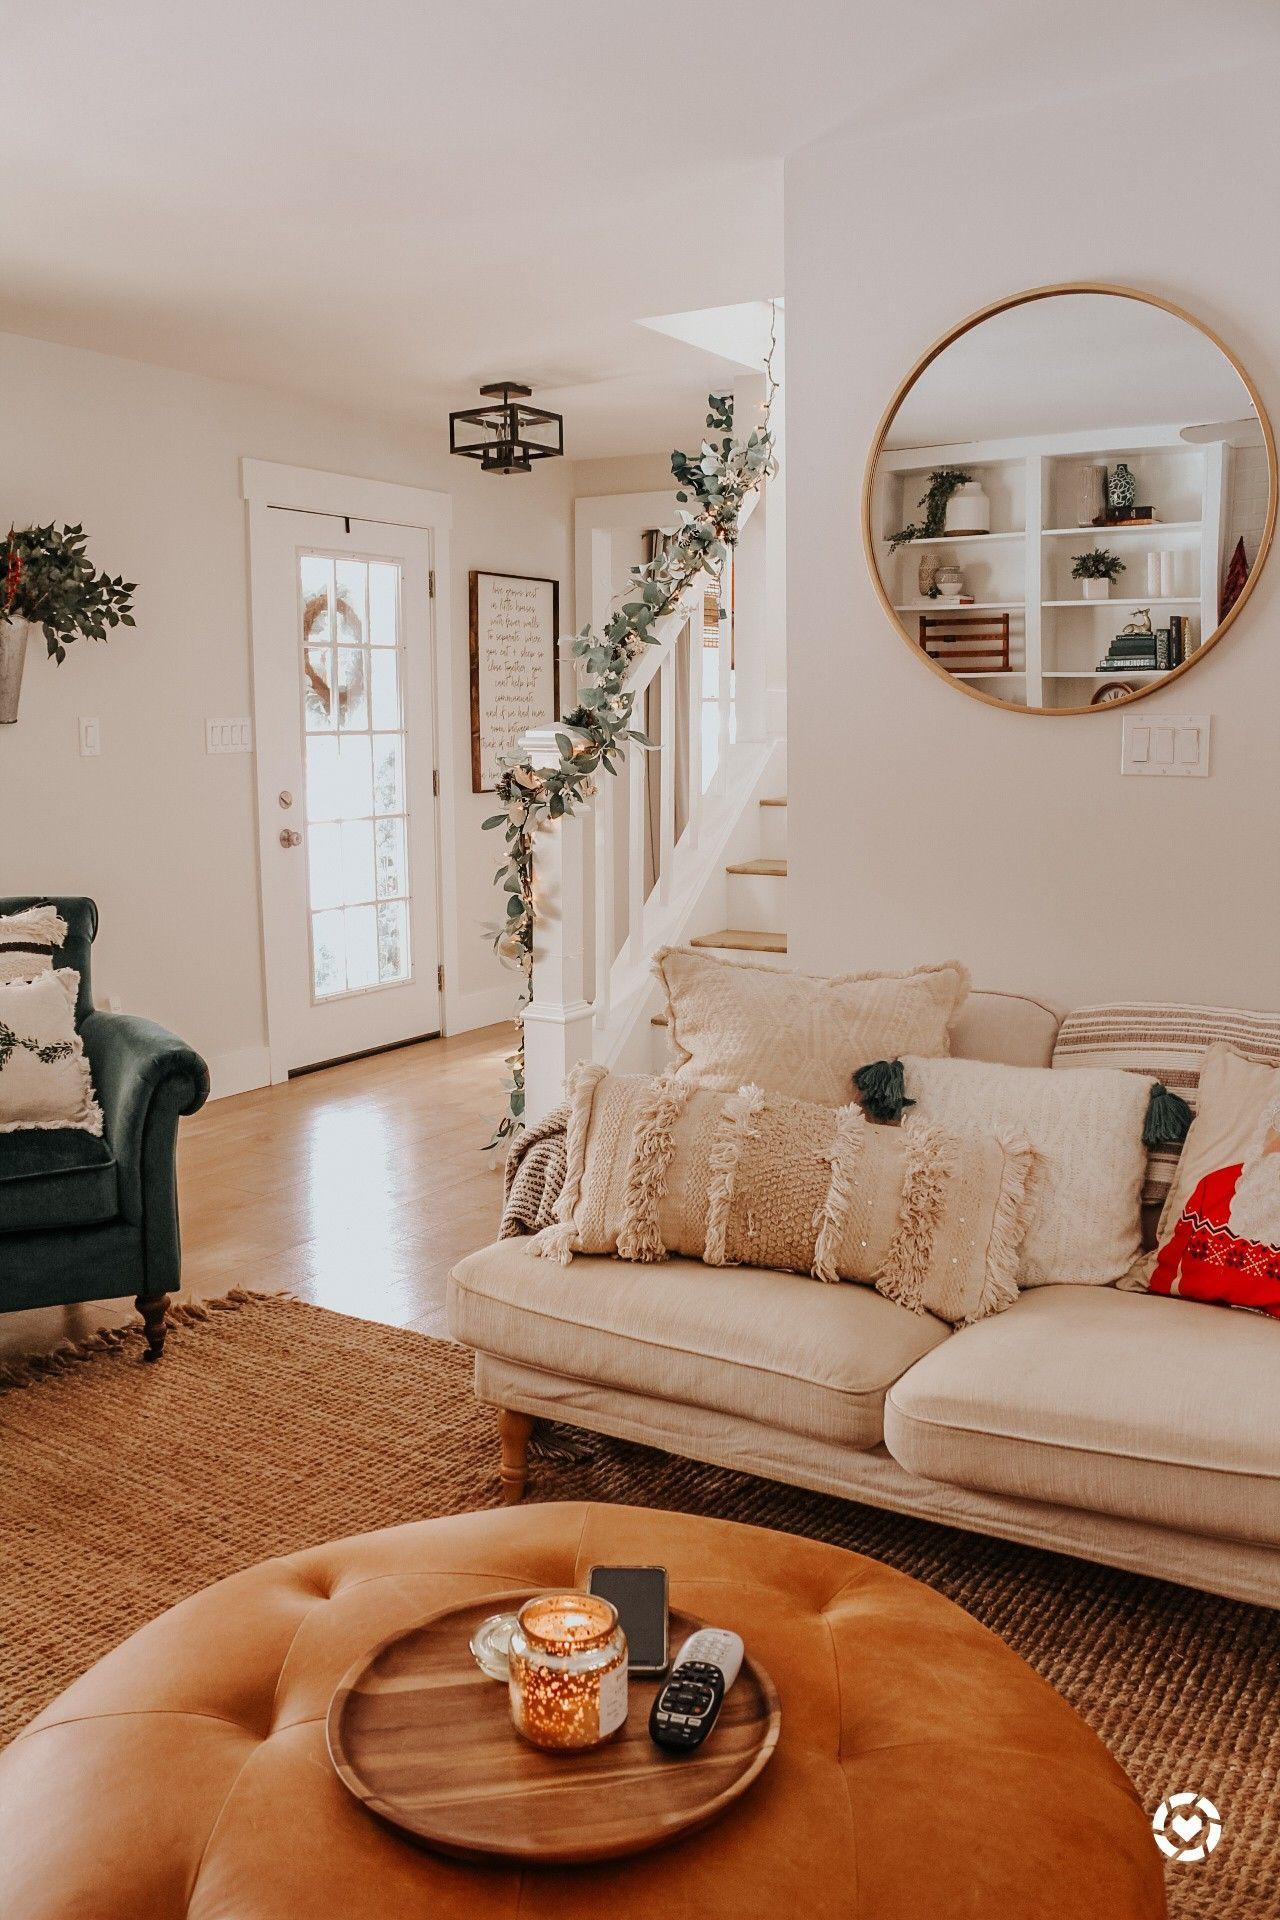 Livingroomstorage Home Cozy House House Interior